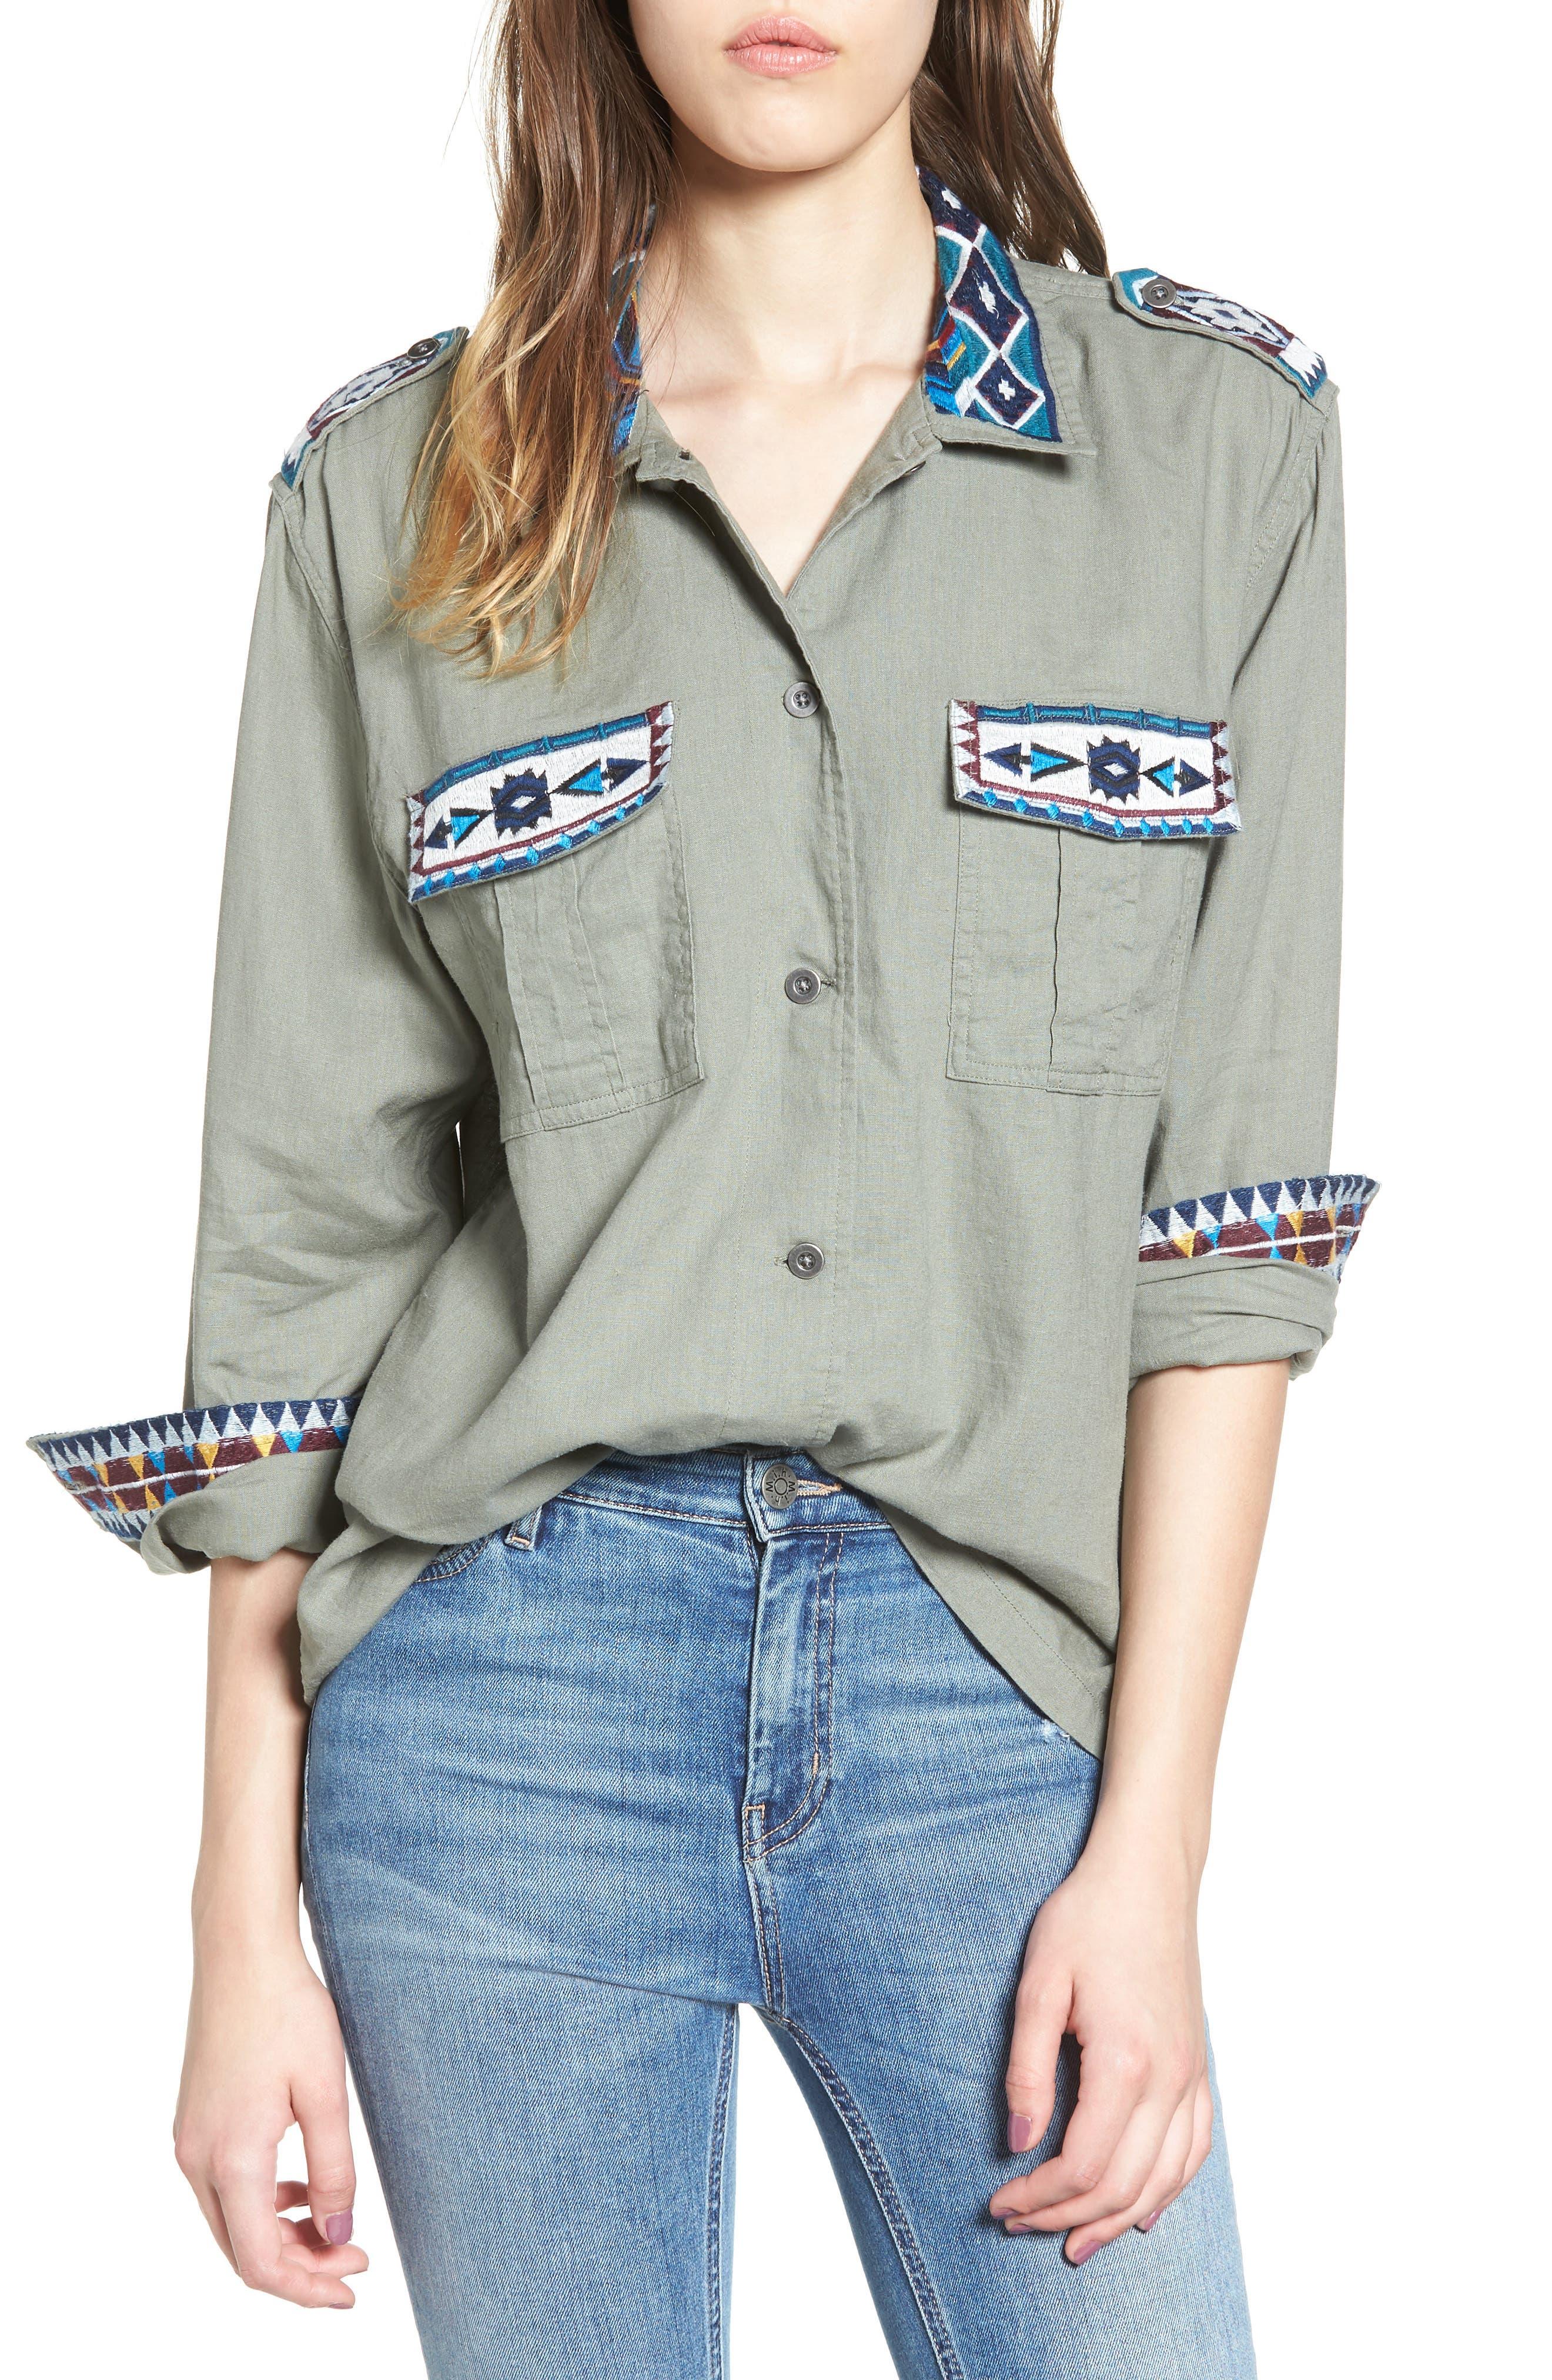 Alternate Image 1 Selected - Rails Kona Embroidered Shirt